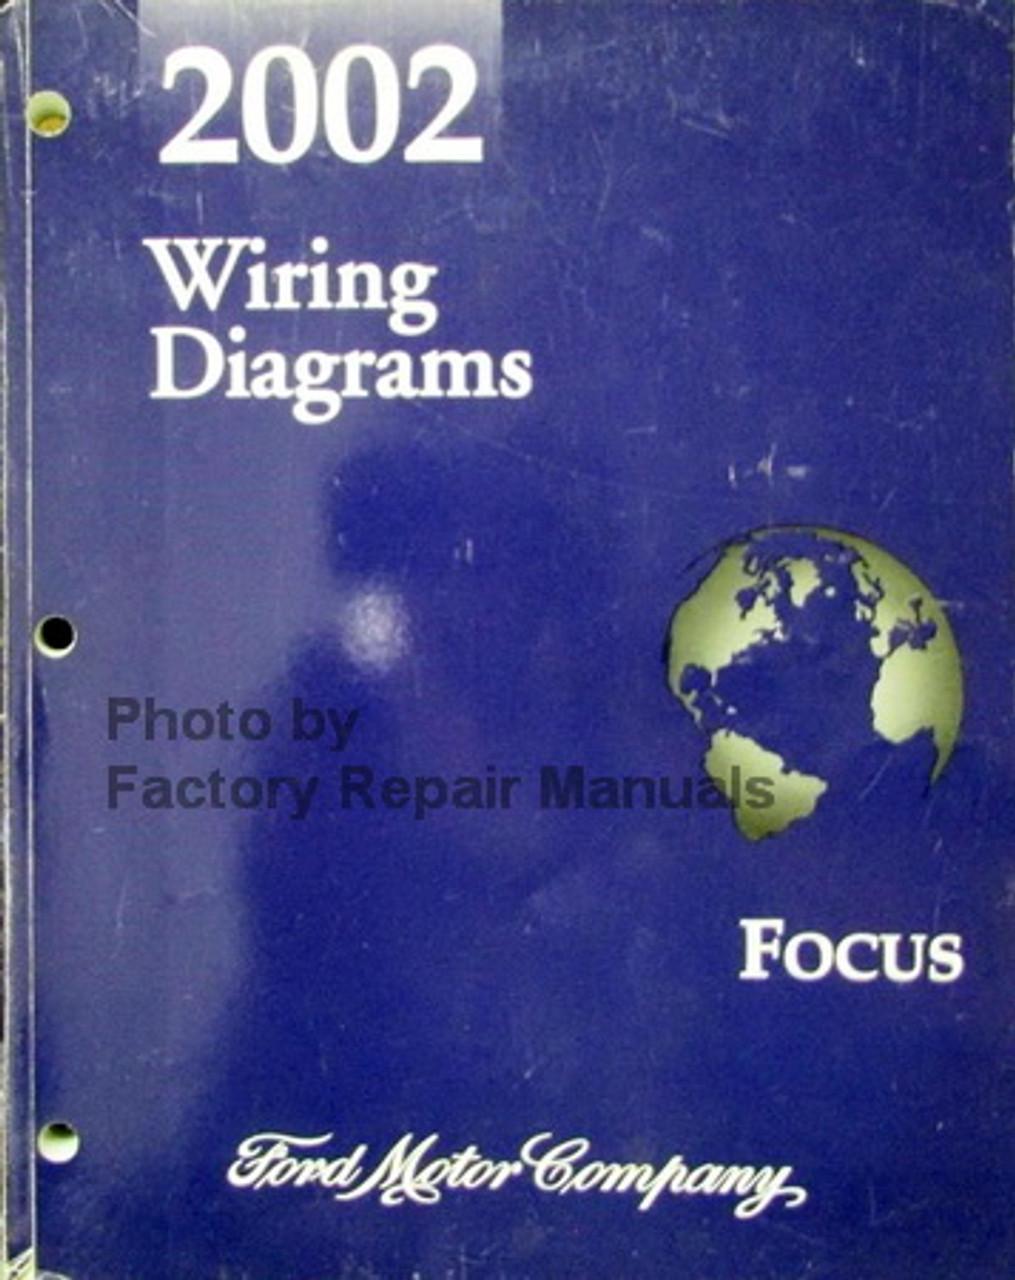 2002 Ford Focus Electrical Wiring Diagrams Original